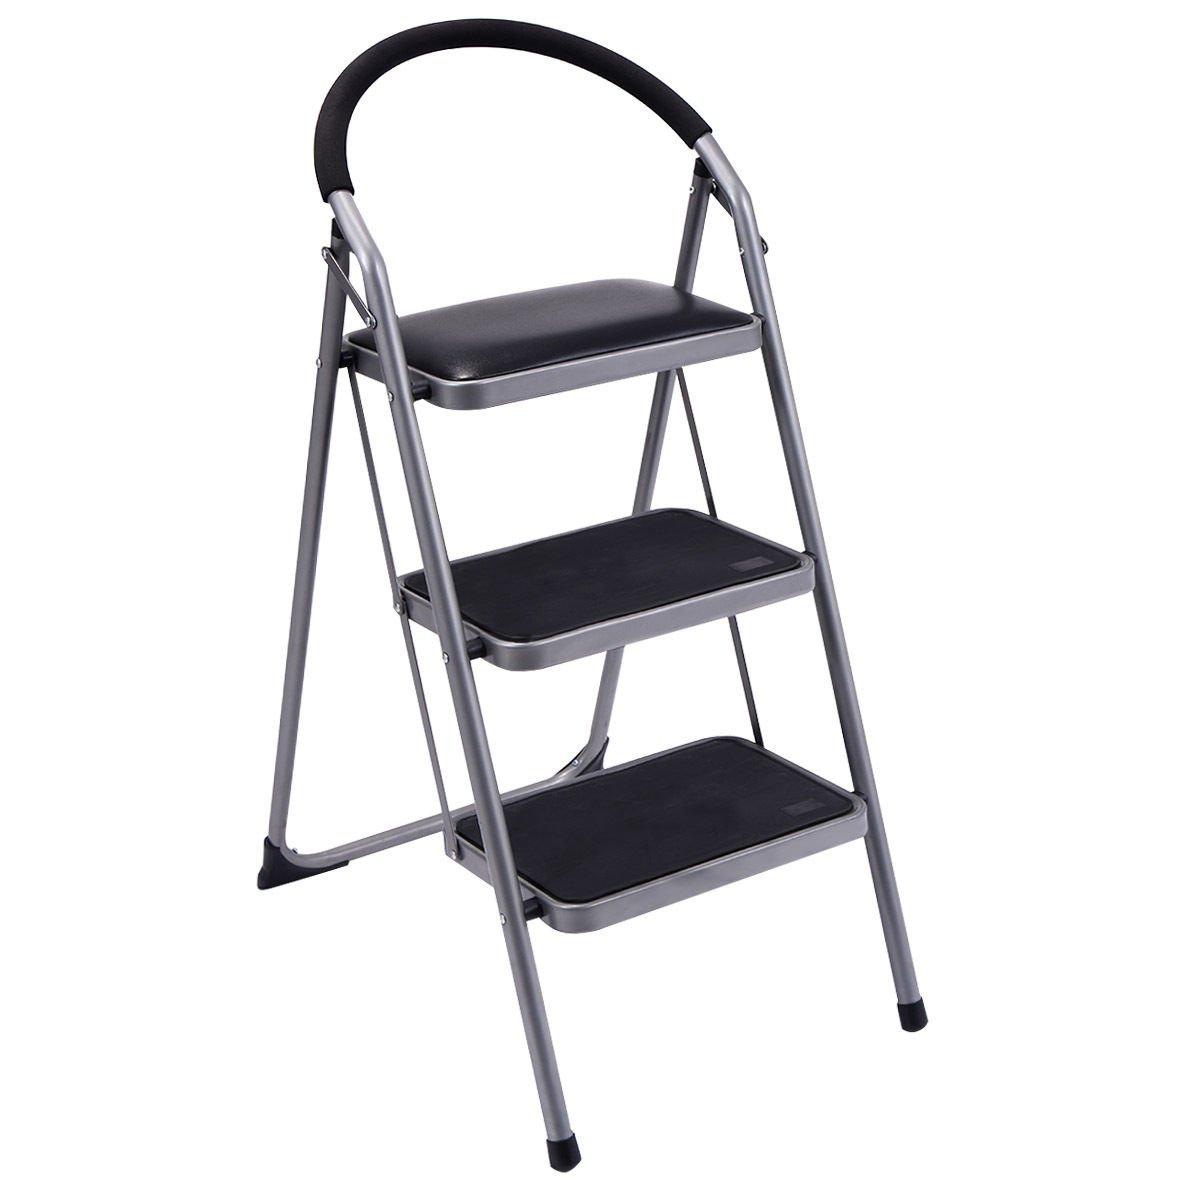 Ginatex Non-slip 3 Step Ladder Lightweight Folding Stool Platform Heavy Duty Industrial (3 Step)